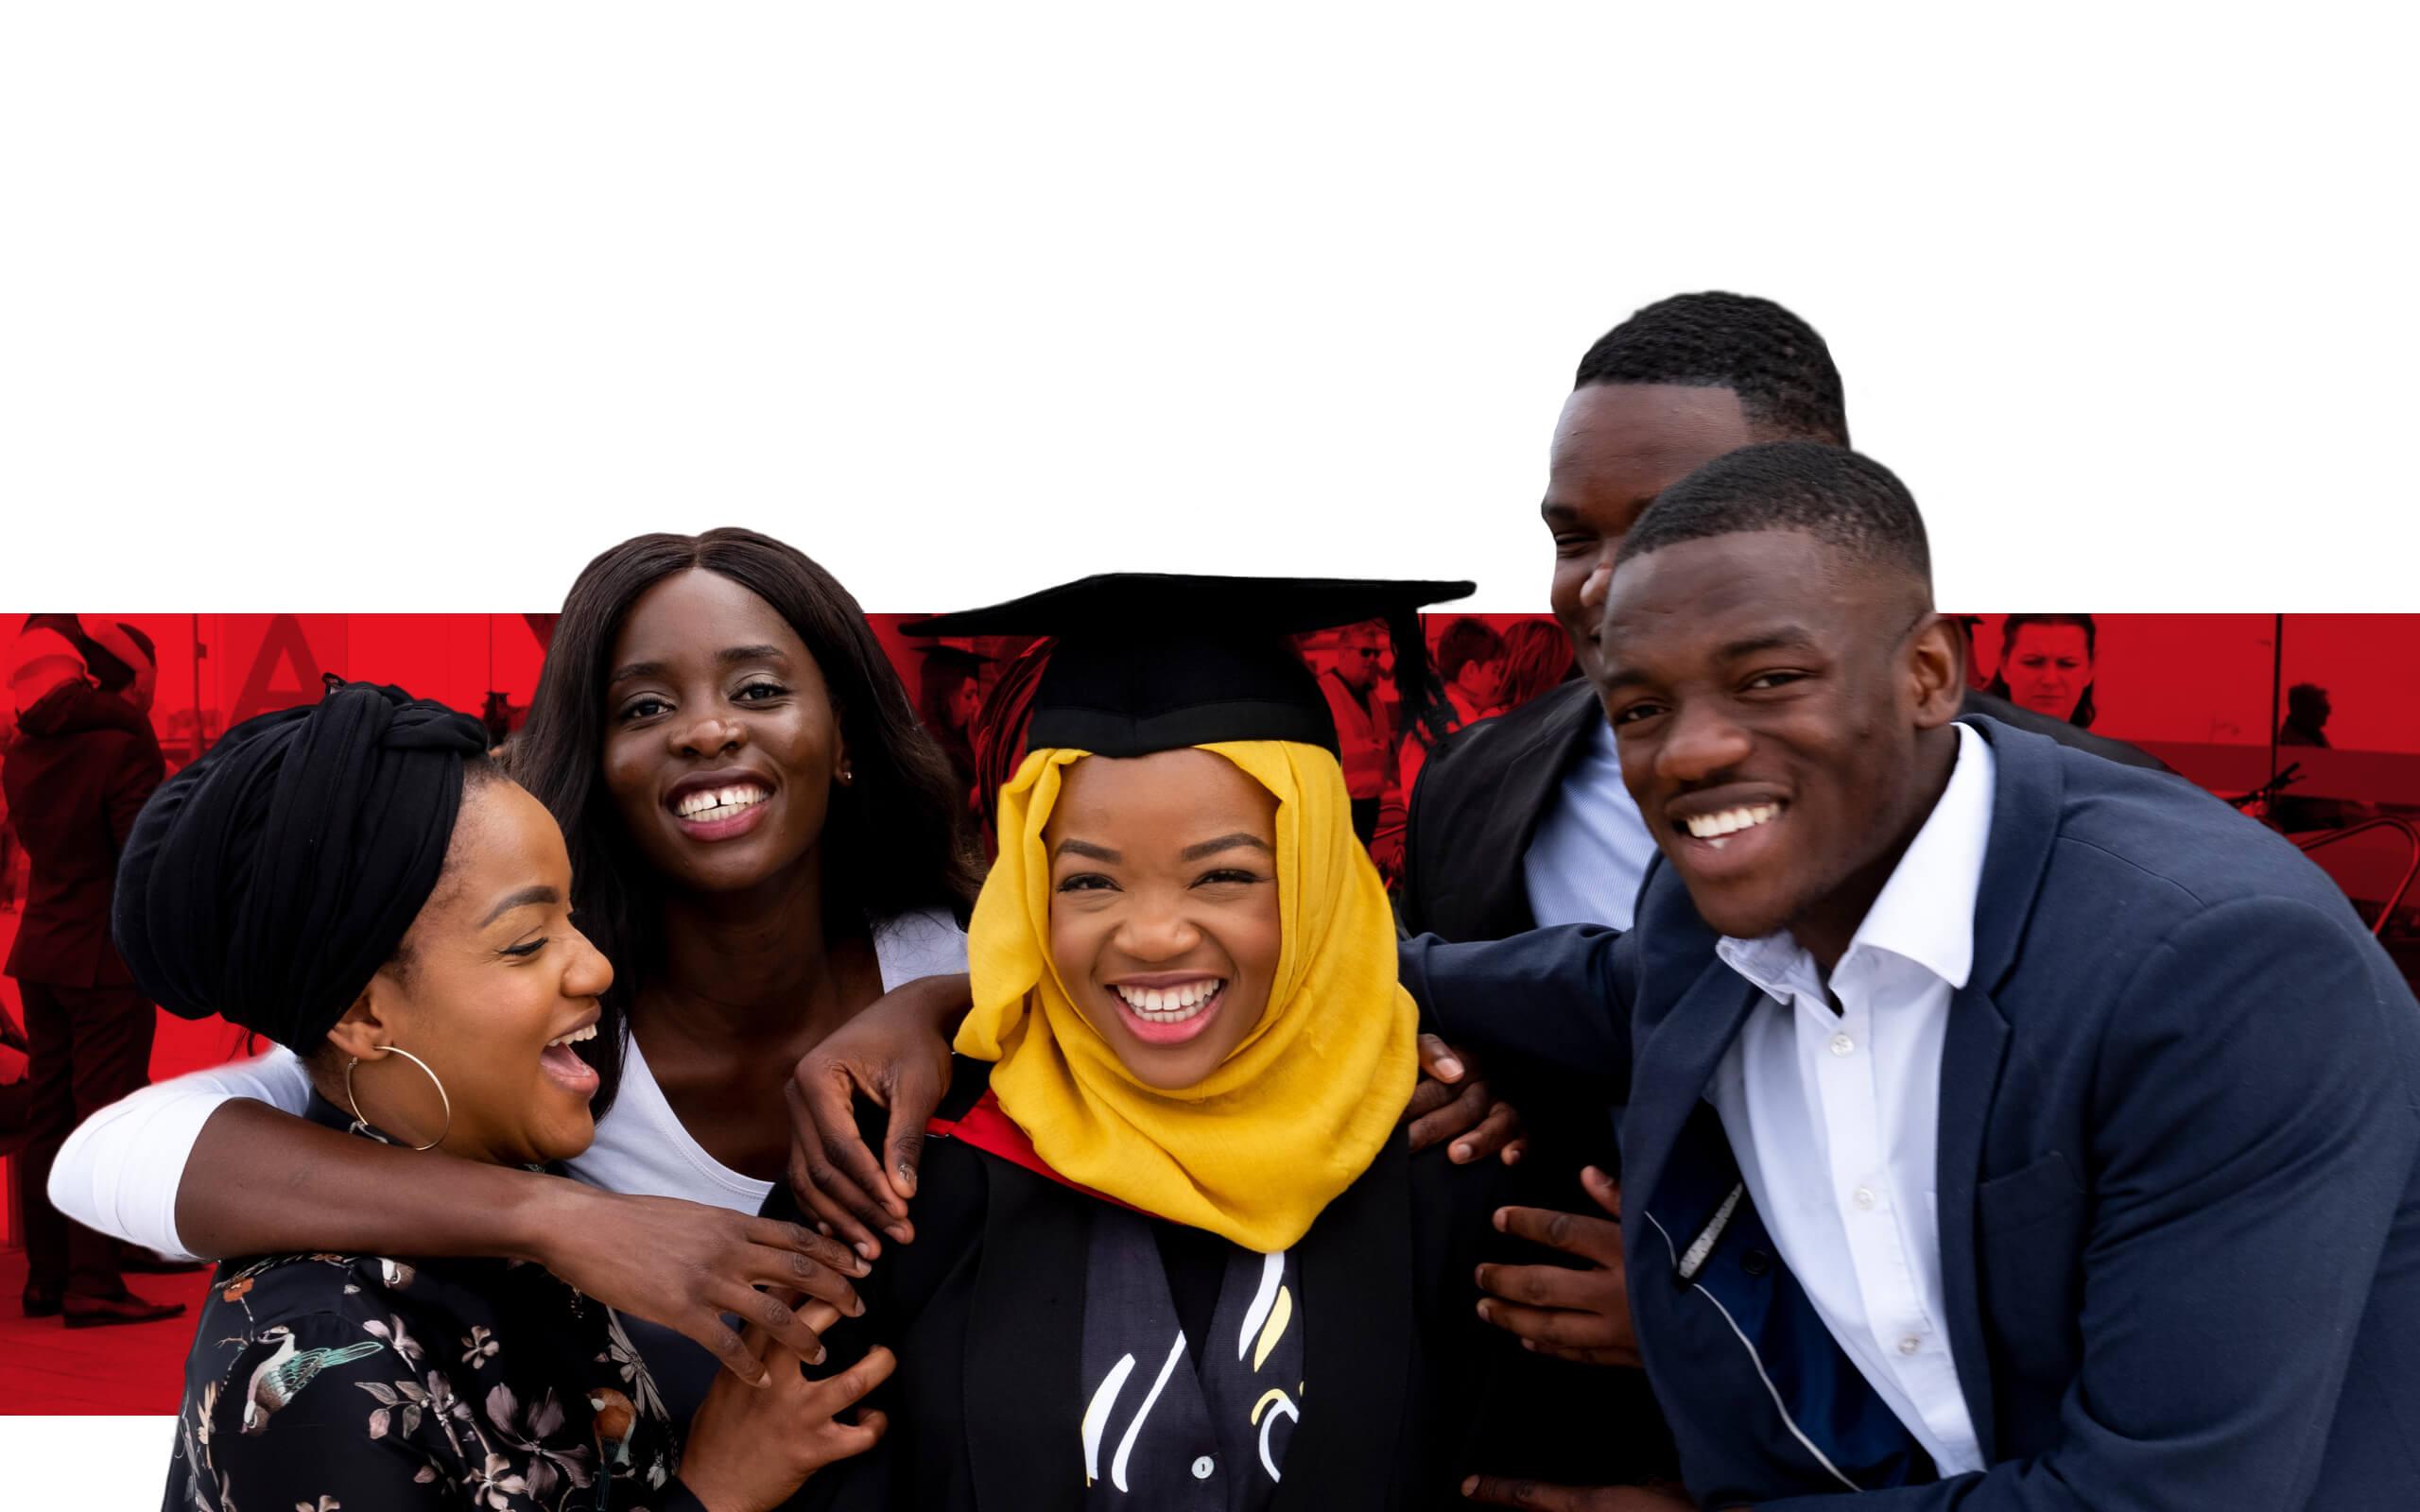 Graduates having a photograph together